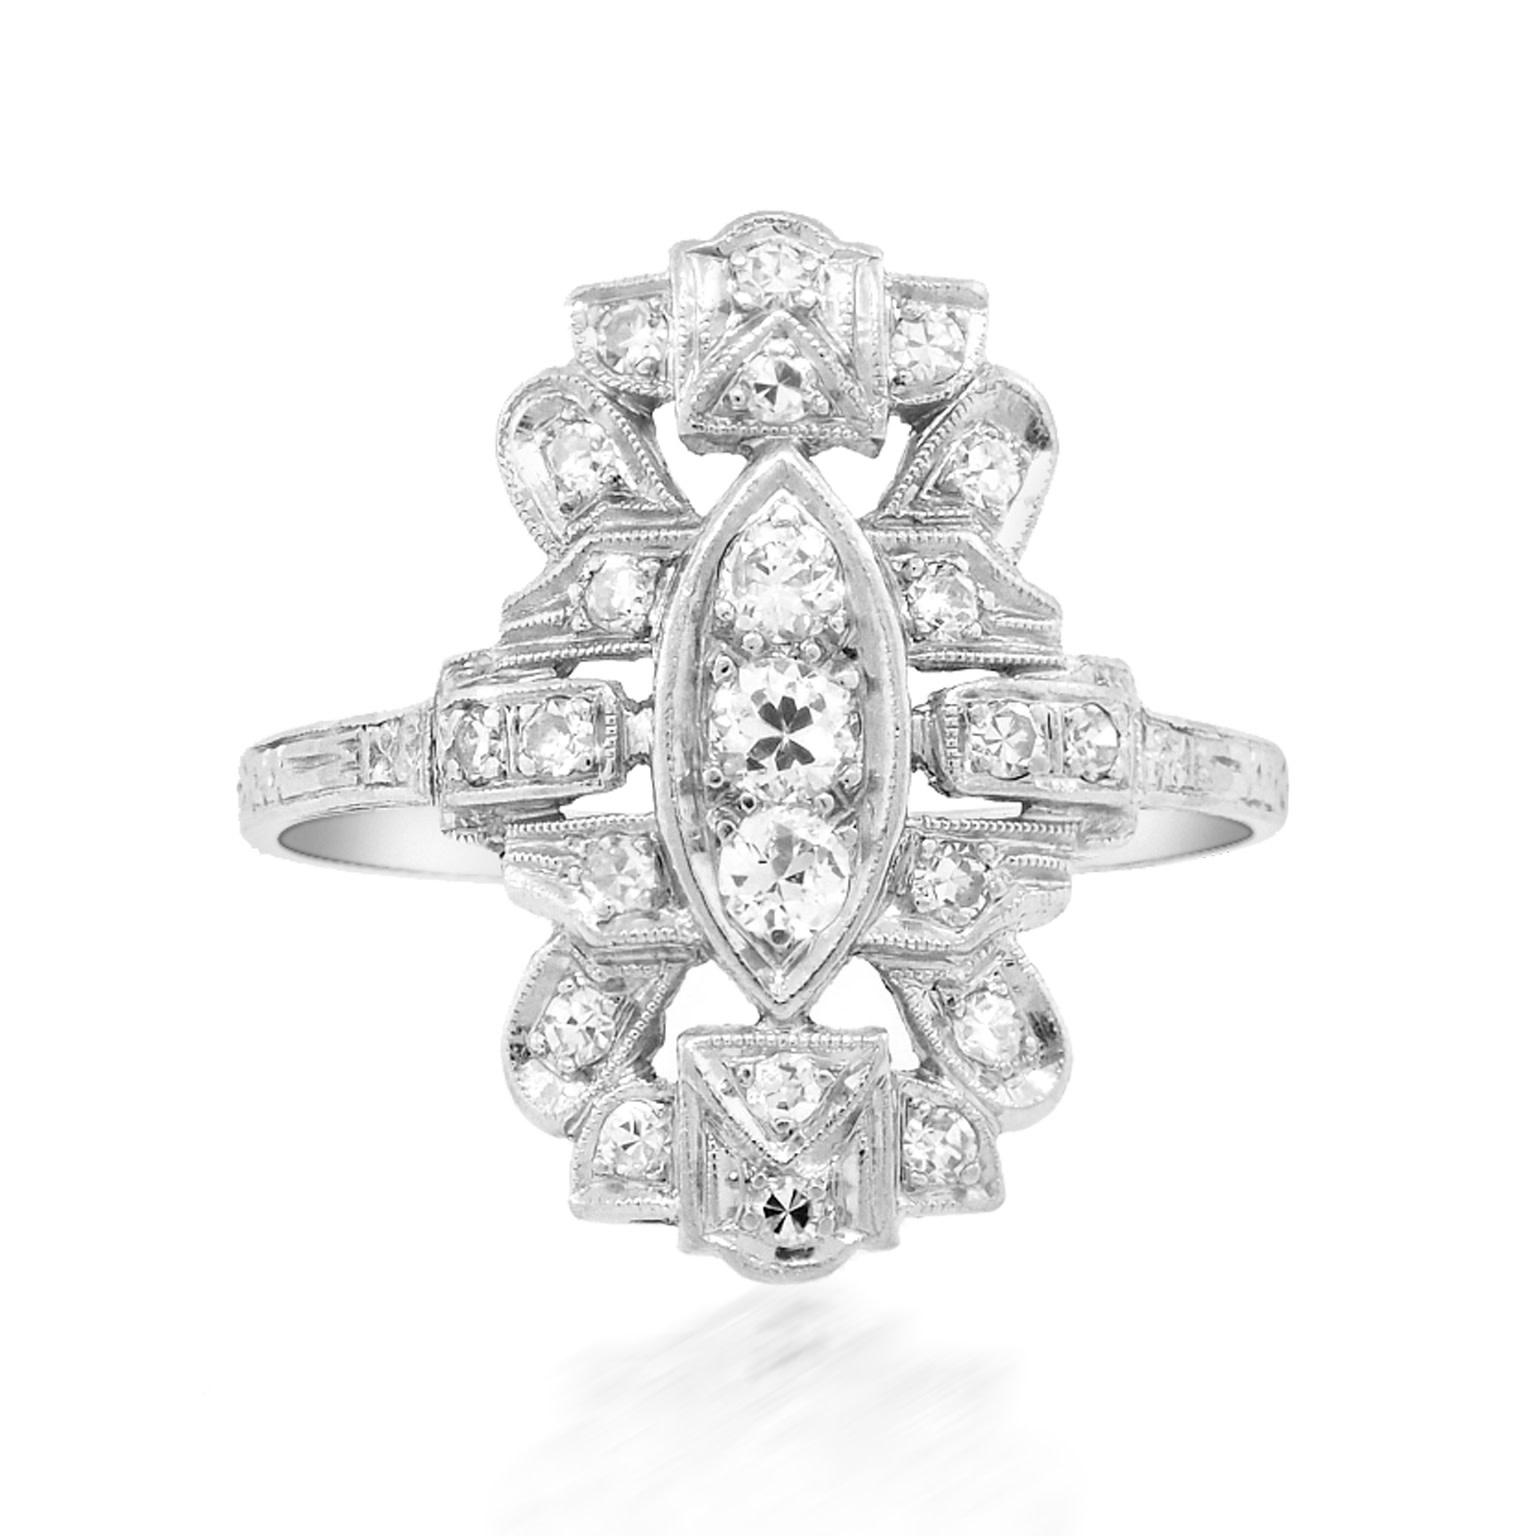 Trabert Goldsmiths Antique Deco Diamond Cocktail Ring